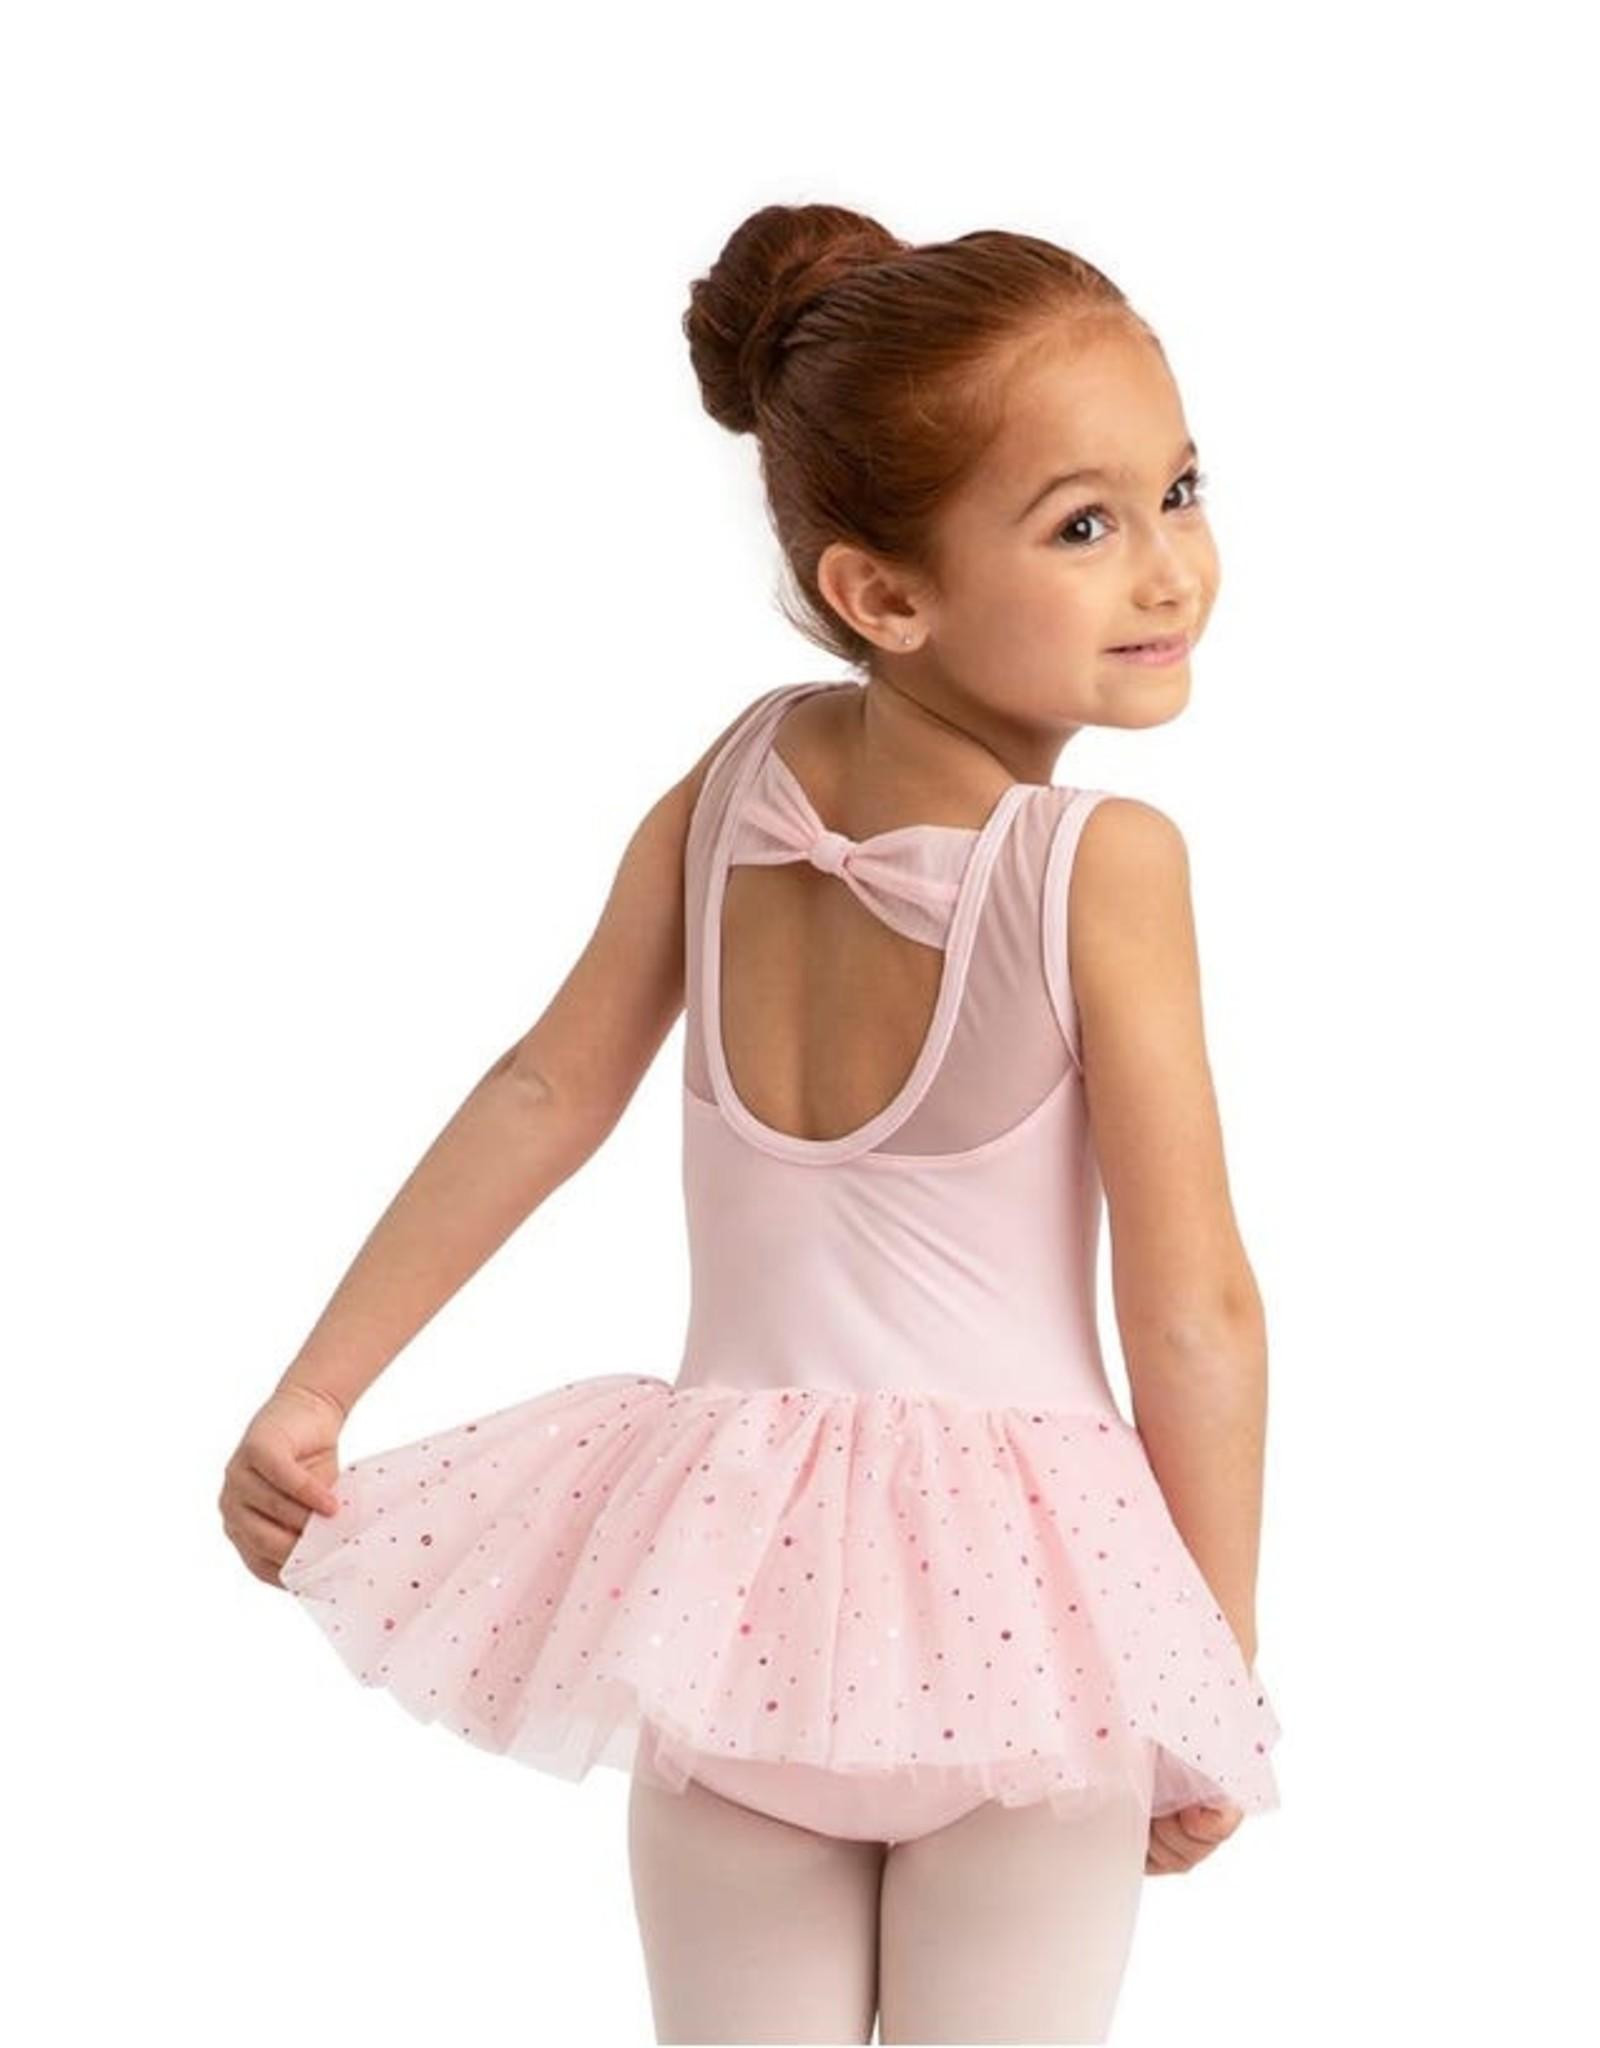 Capezio Children's Collection Back Keyhole Tutu Dress - Girls